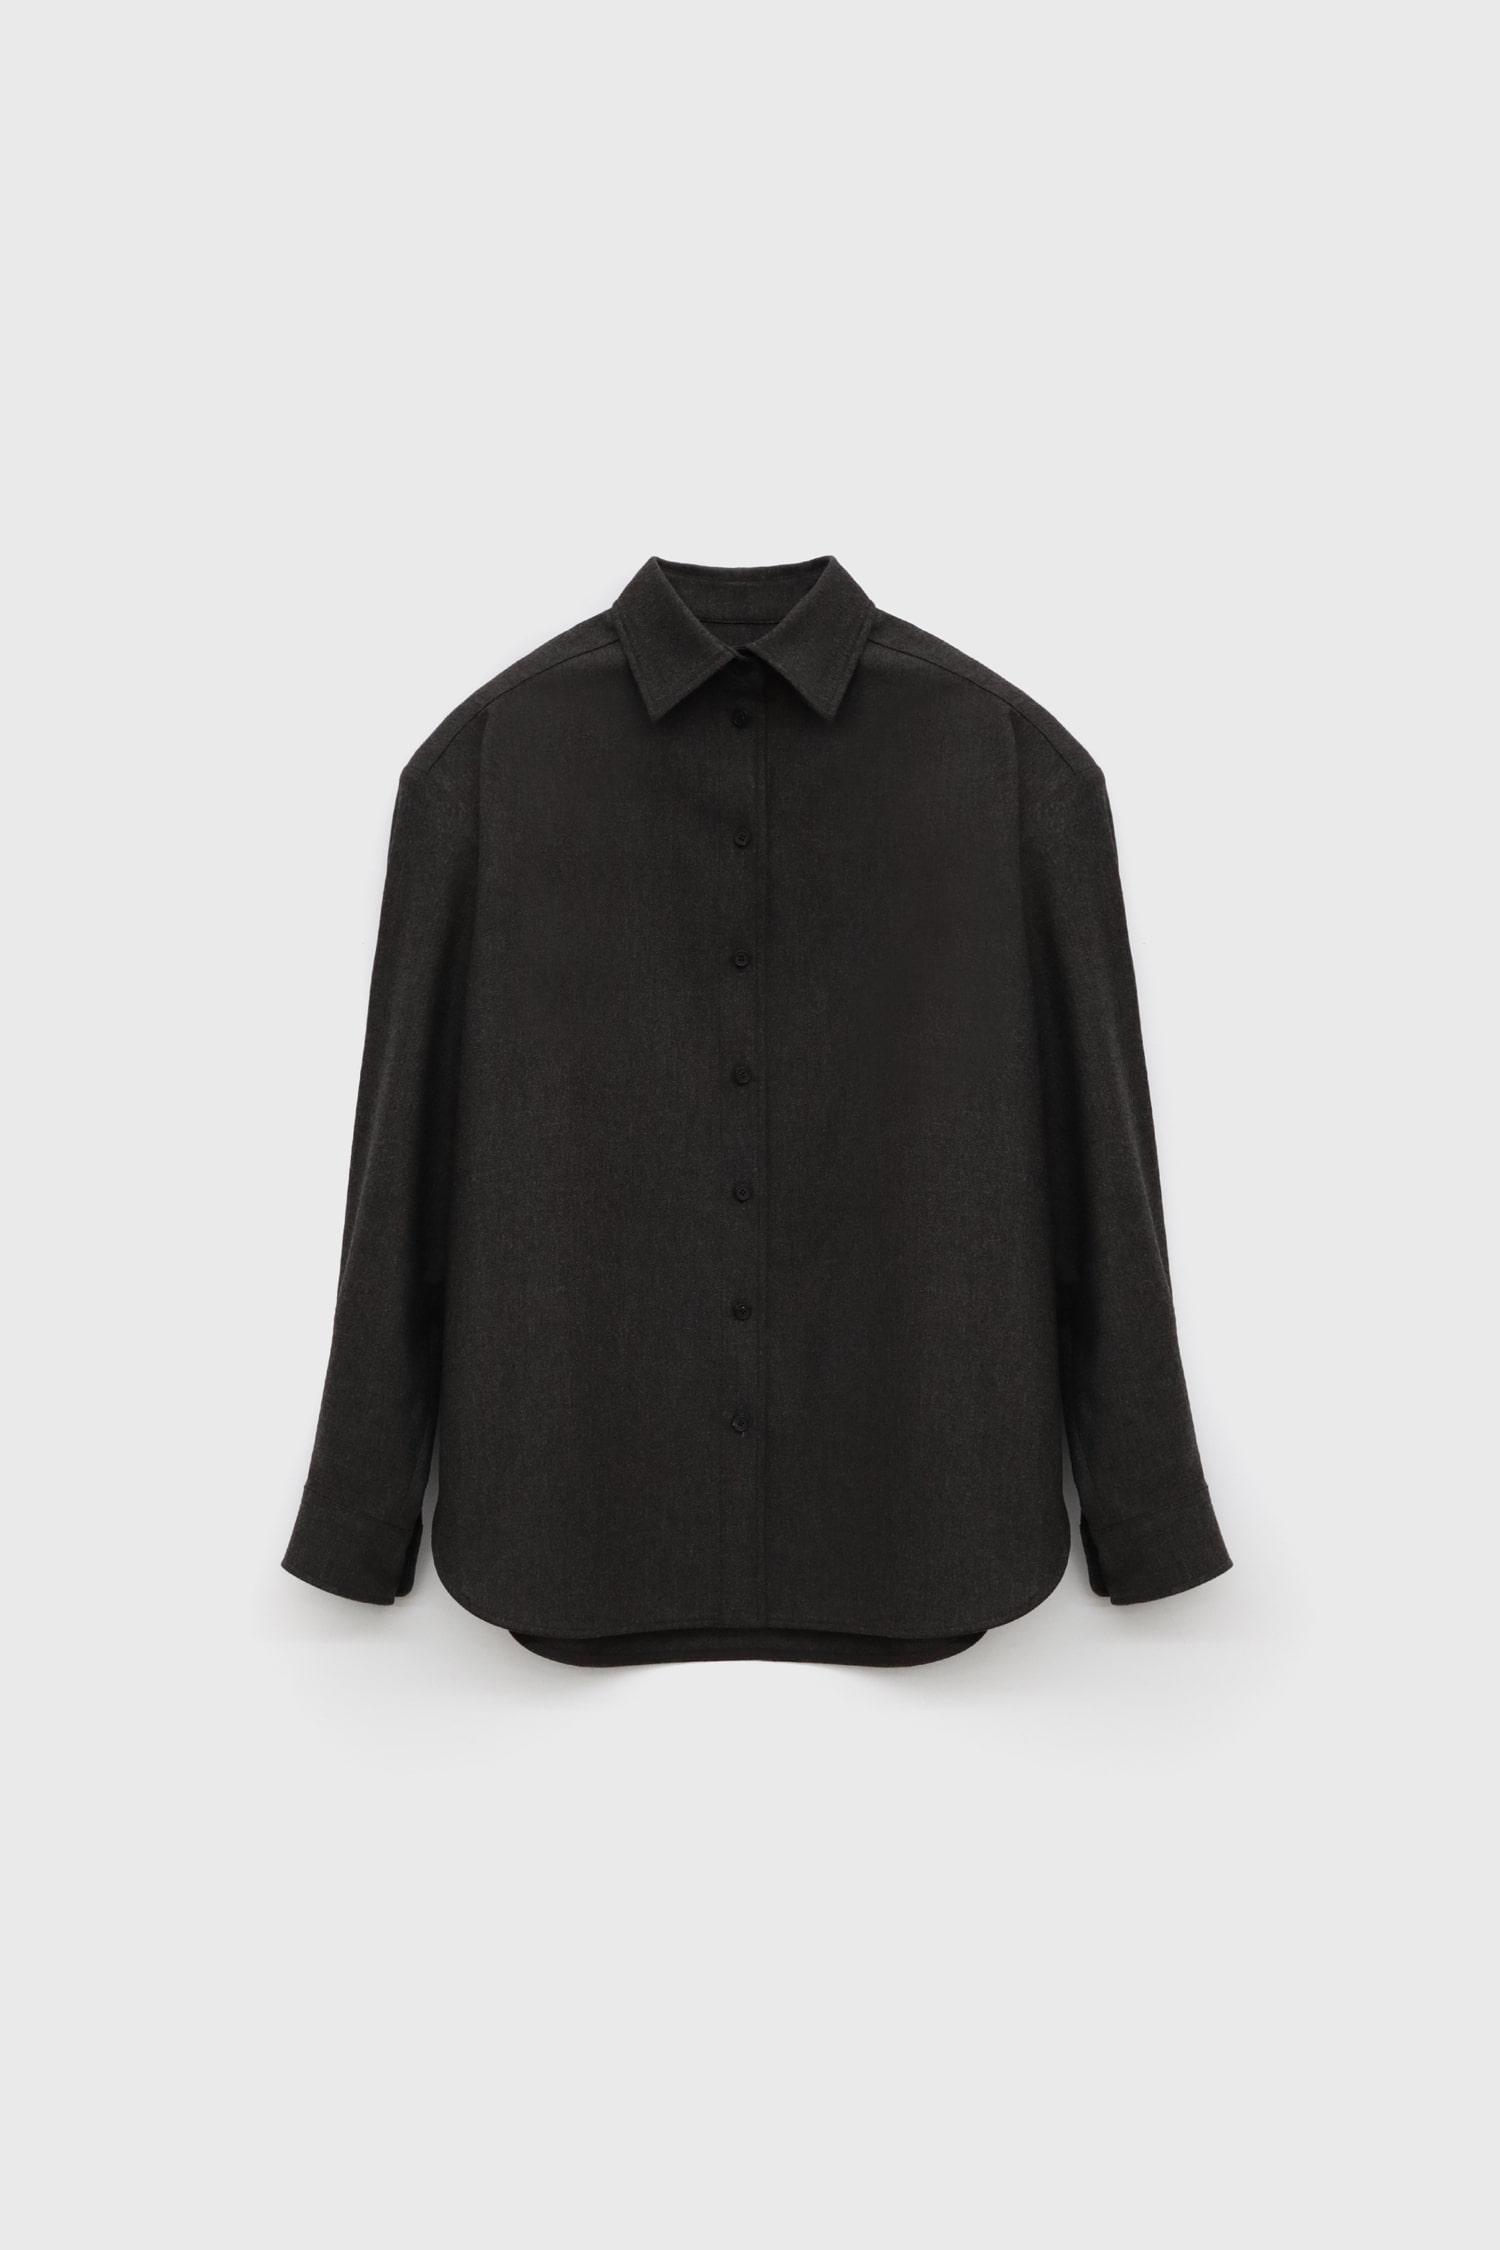 Shoulder Pad Overshirt